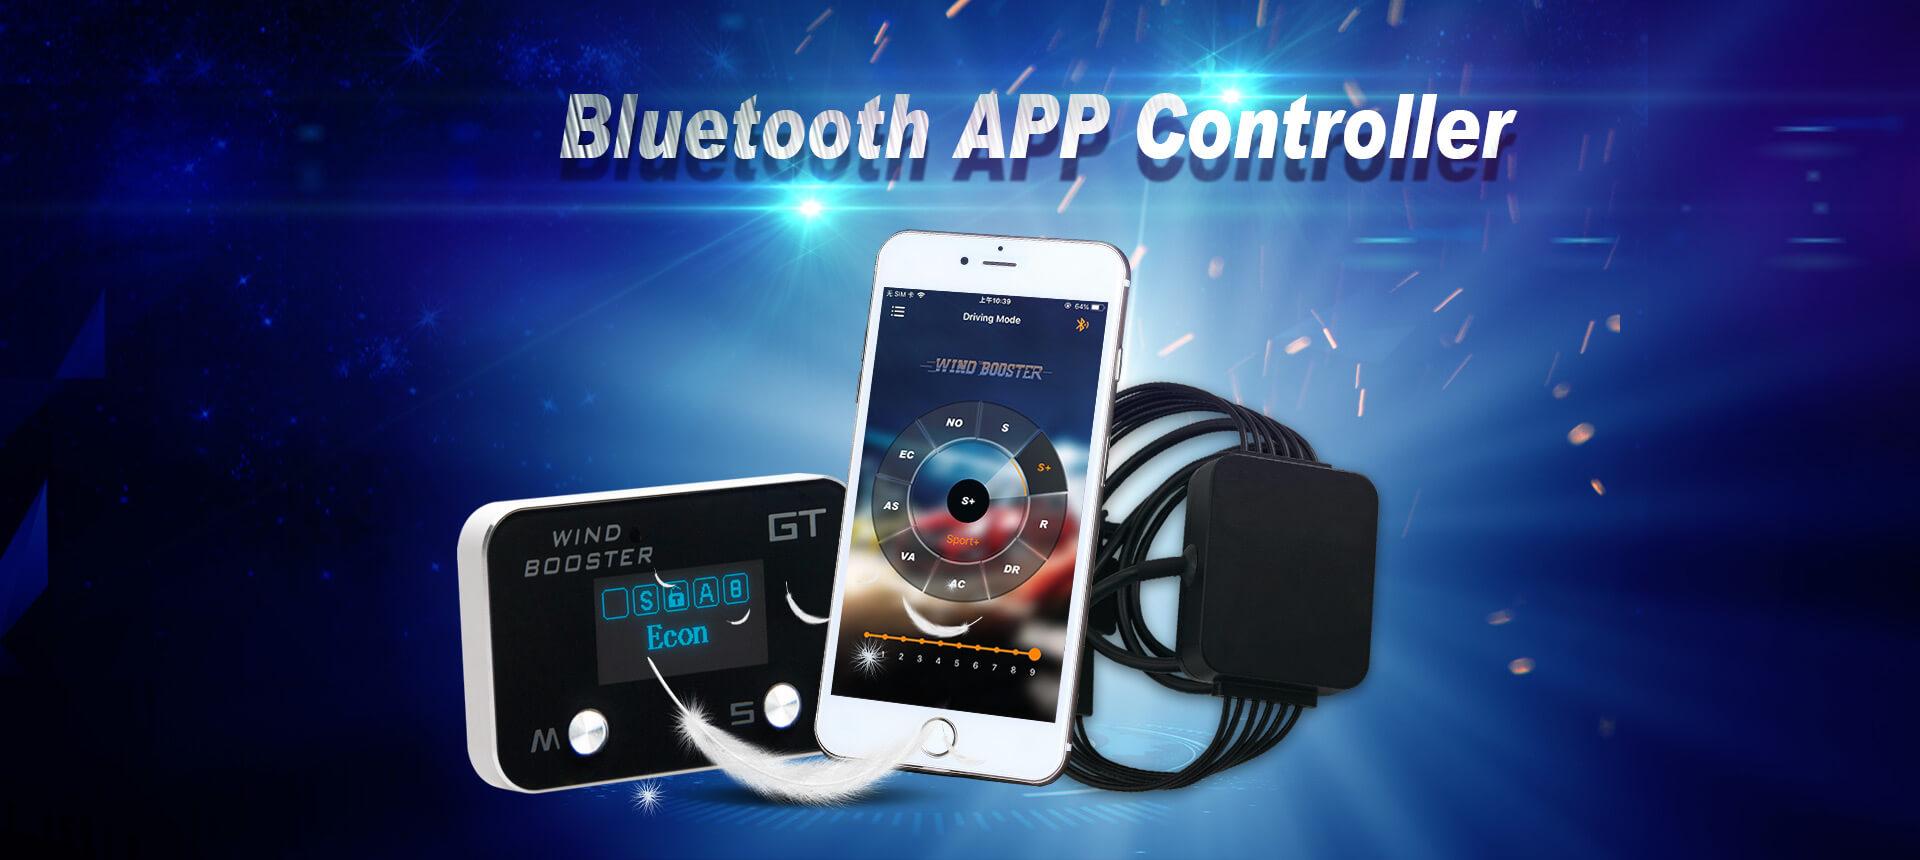 bluetooth app controller